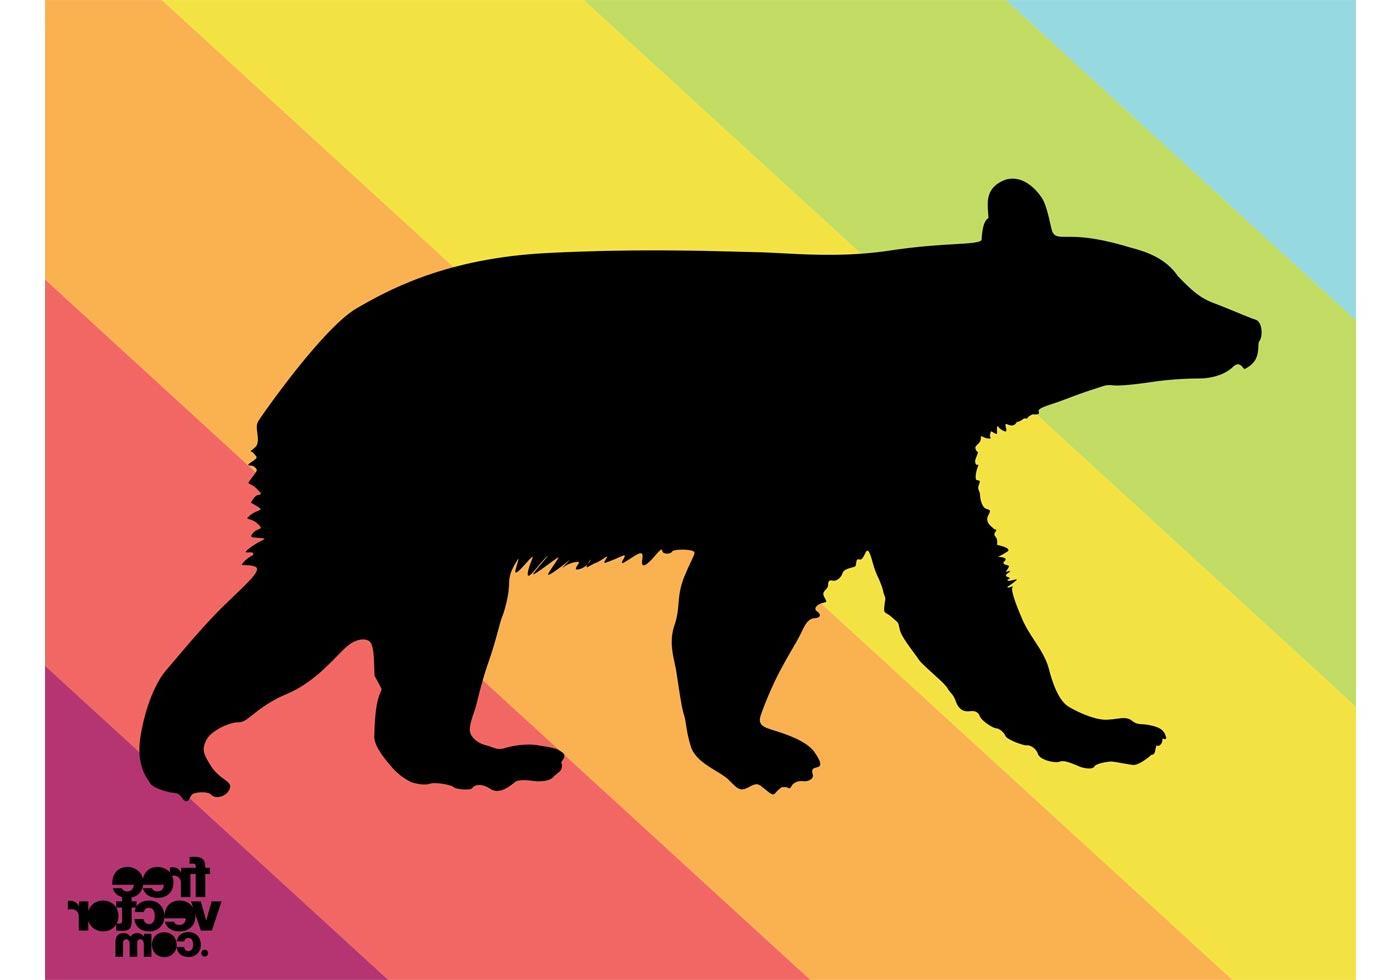 1400x980 Best 15 Vector Bear Cub Silhouette Design